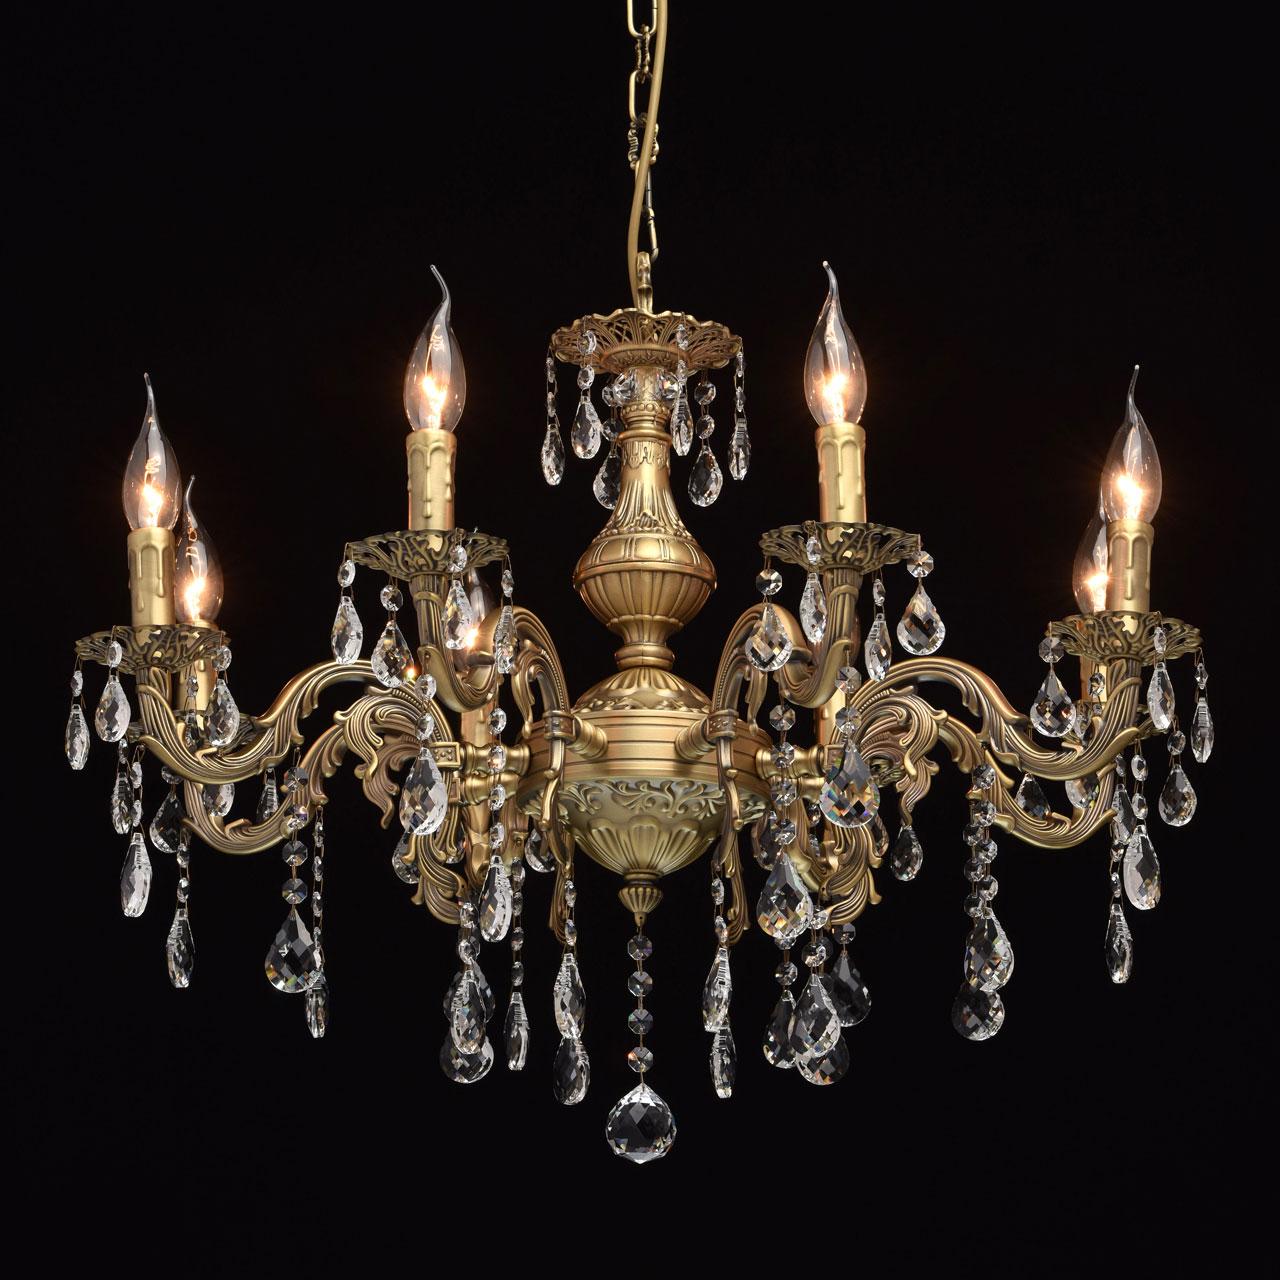 Люстра Mw lightЛюстры<br>Назначение светильника: для спальни,<br>Стиль светильника: классика,<br>Тип: подвесная,<br>Материал светильника: металл, хрусталь,<br>Материал плафона: хрусталь,<br>Материал арматуры: металл,<br>Длина (мм): 440,<br>Ширина: 300,<br>Высота: 1000,<br>Количество ламп: 8,<br>Тип лампы: накаливания,<br>Мощность: 60,<br>Патрон: Е14,<br>Цвет арматуры: бронза,<br>Коллекция: Свеча<br>